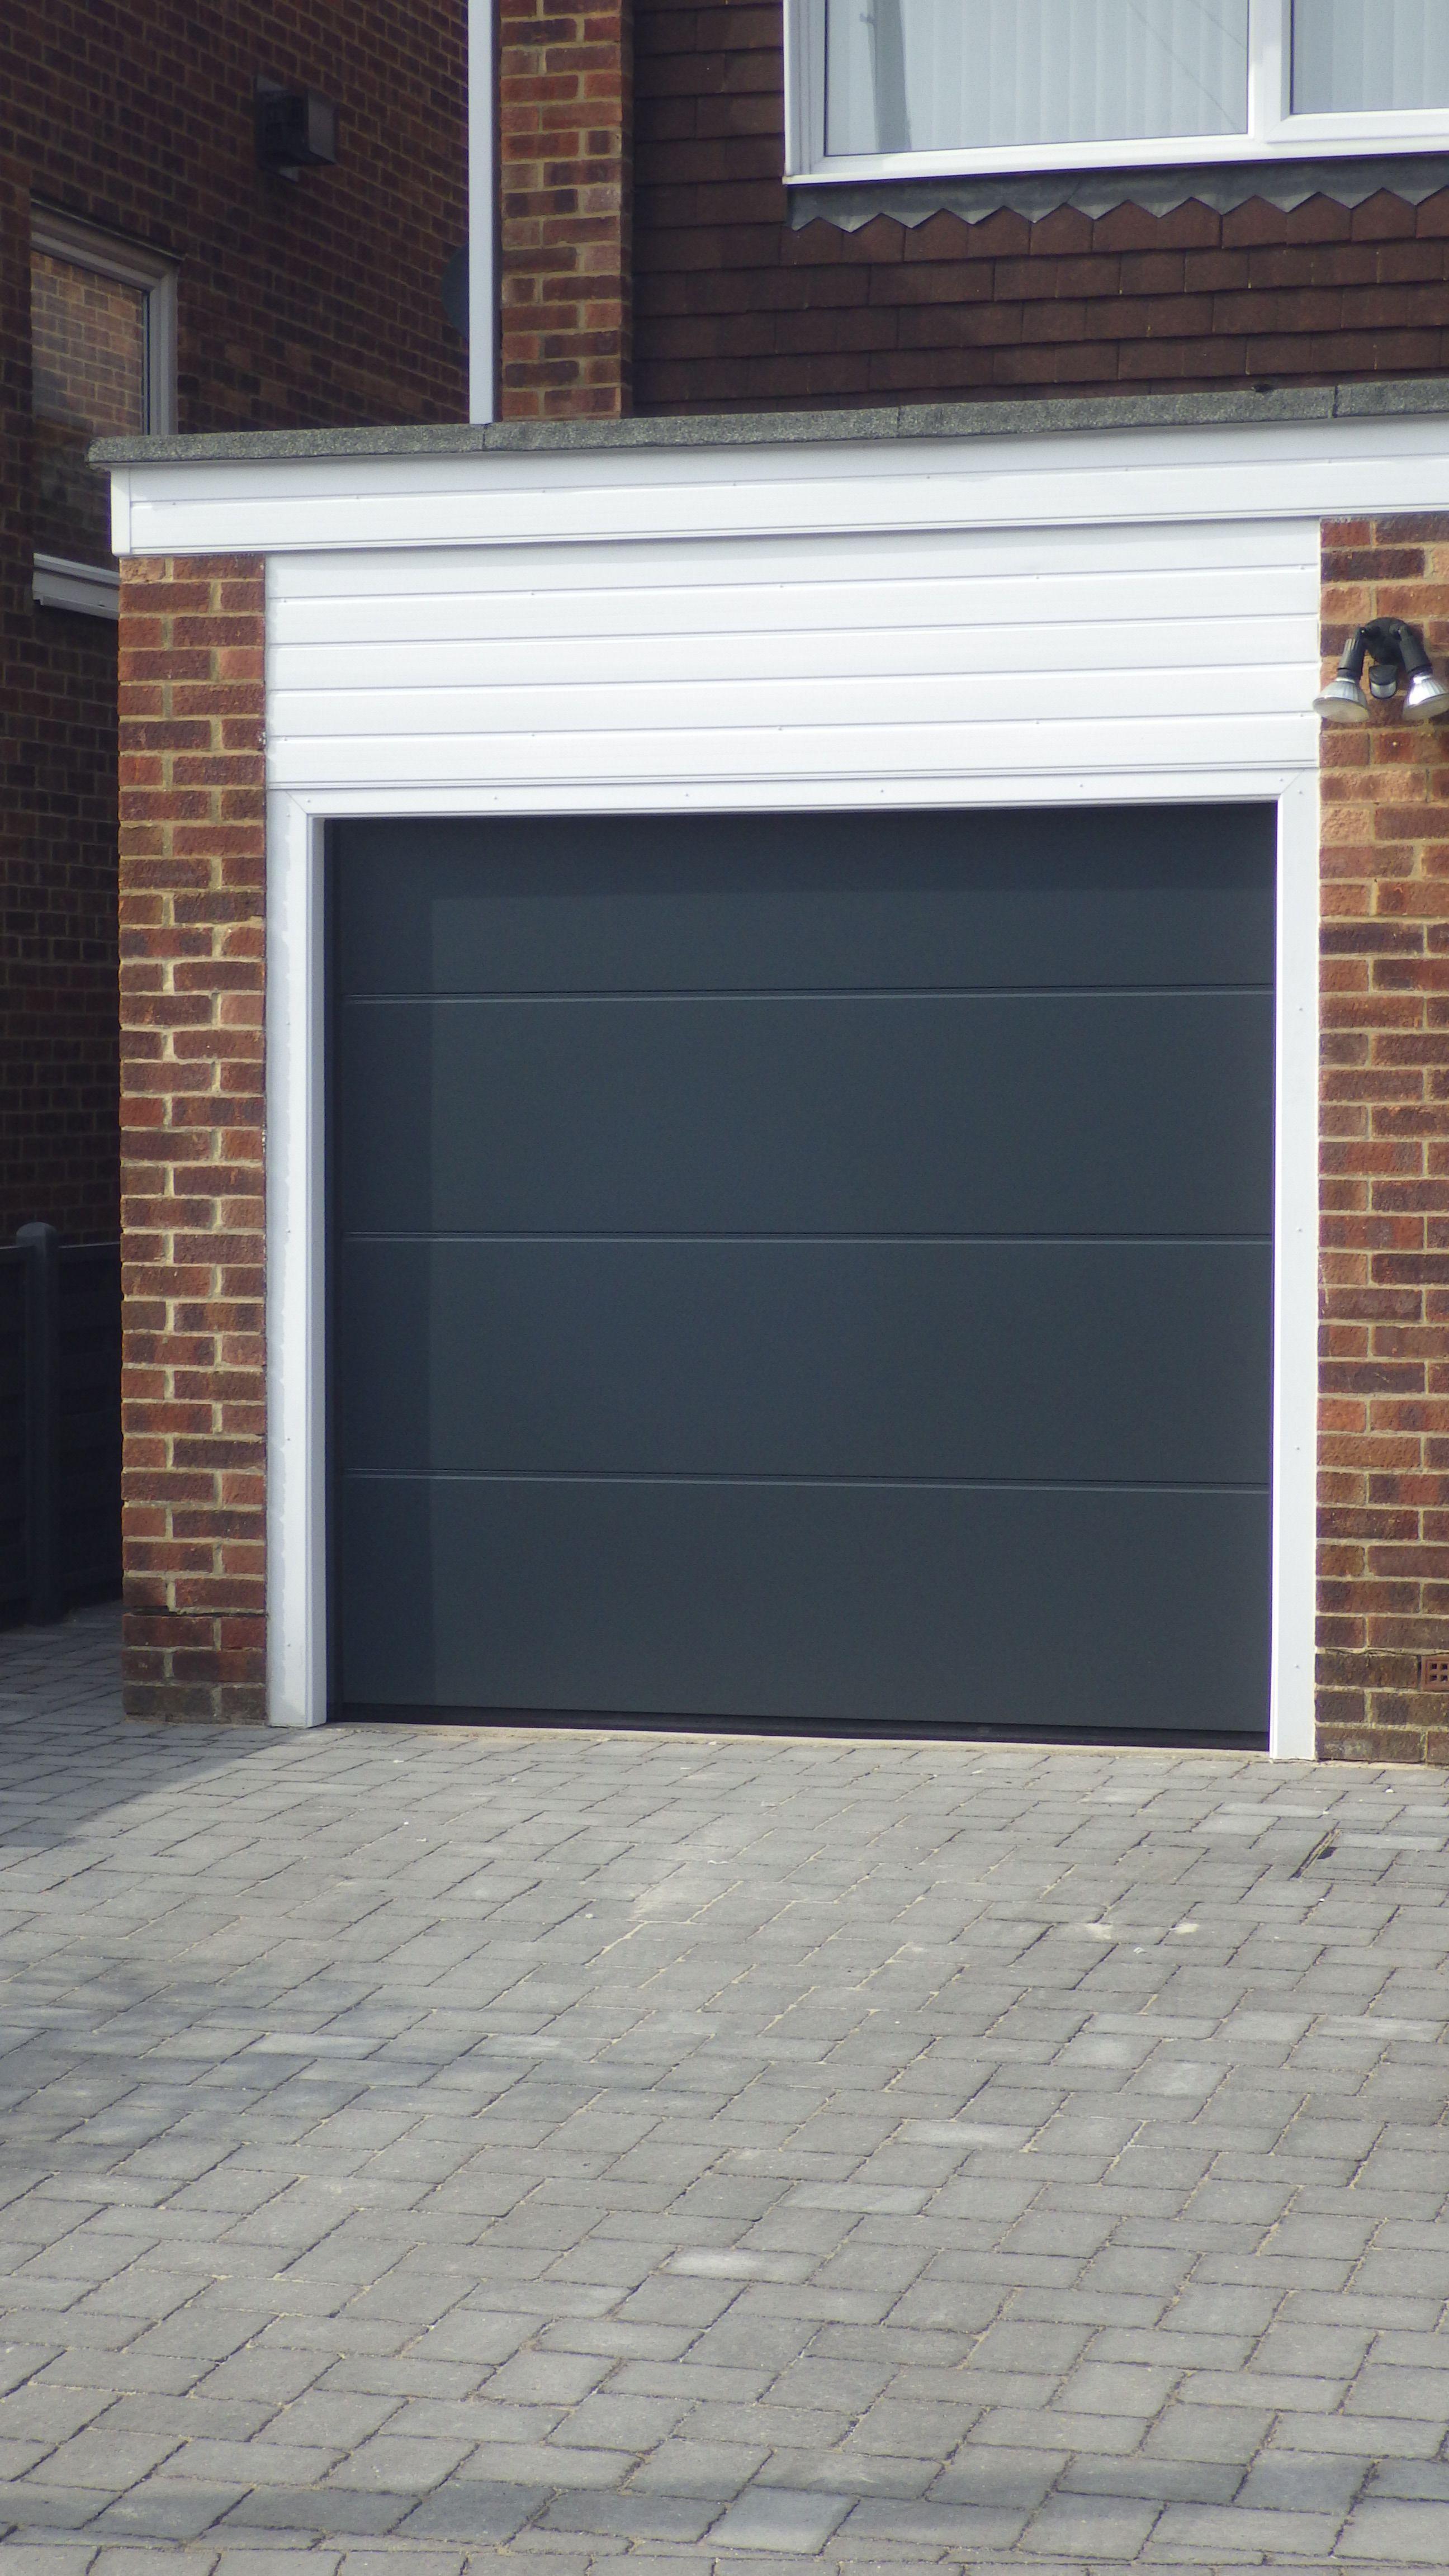 Hormann Sectional L Ribbed Garage Door In Anthracite Grey Garage